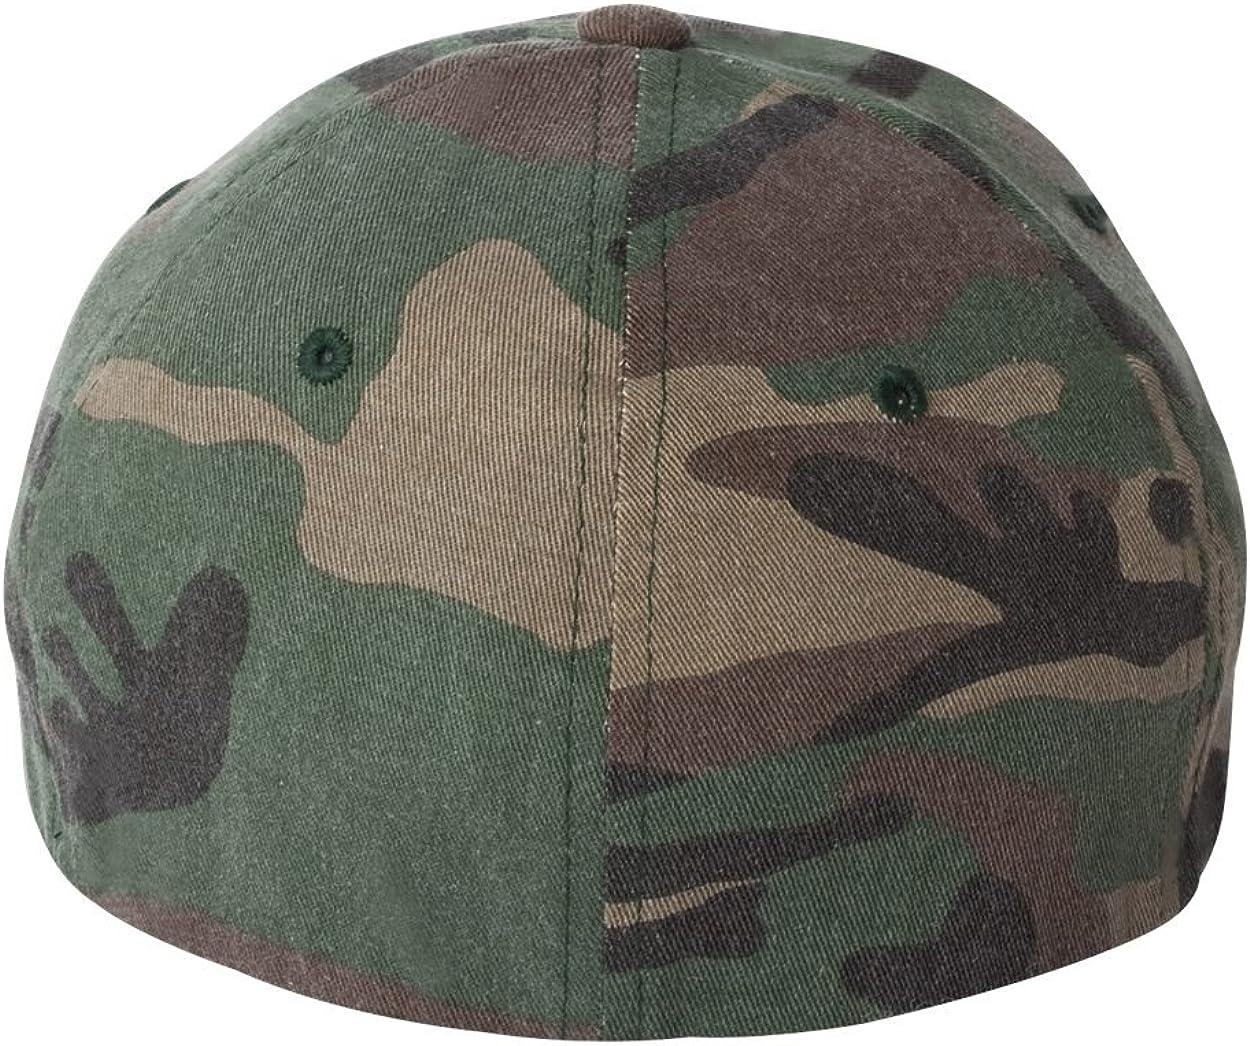 Yupoong 6977CA Flexfit Cotton Camouflage Cap S//M Green Camo